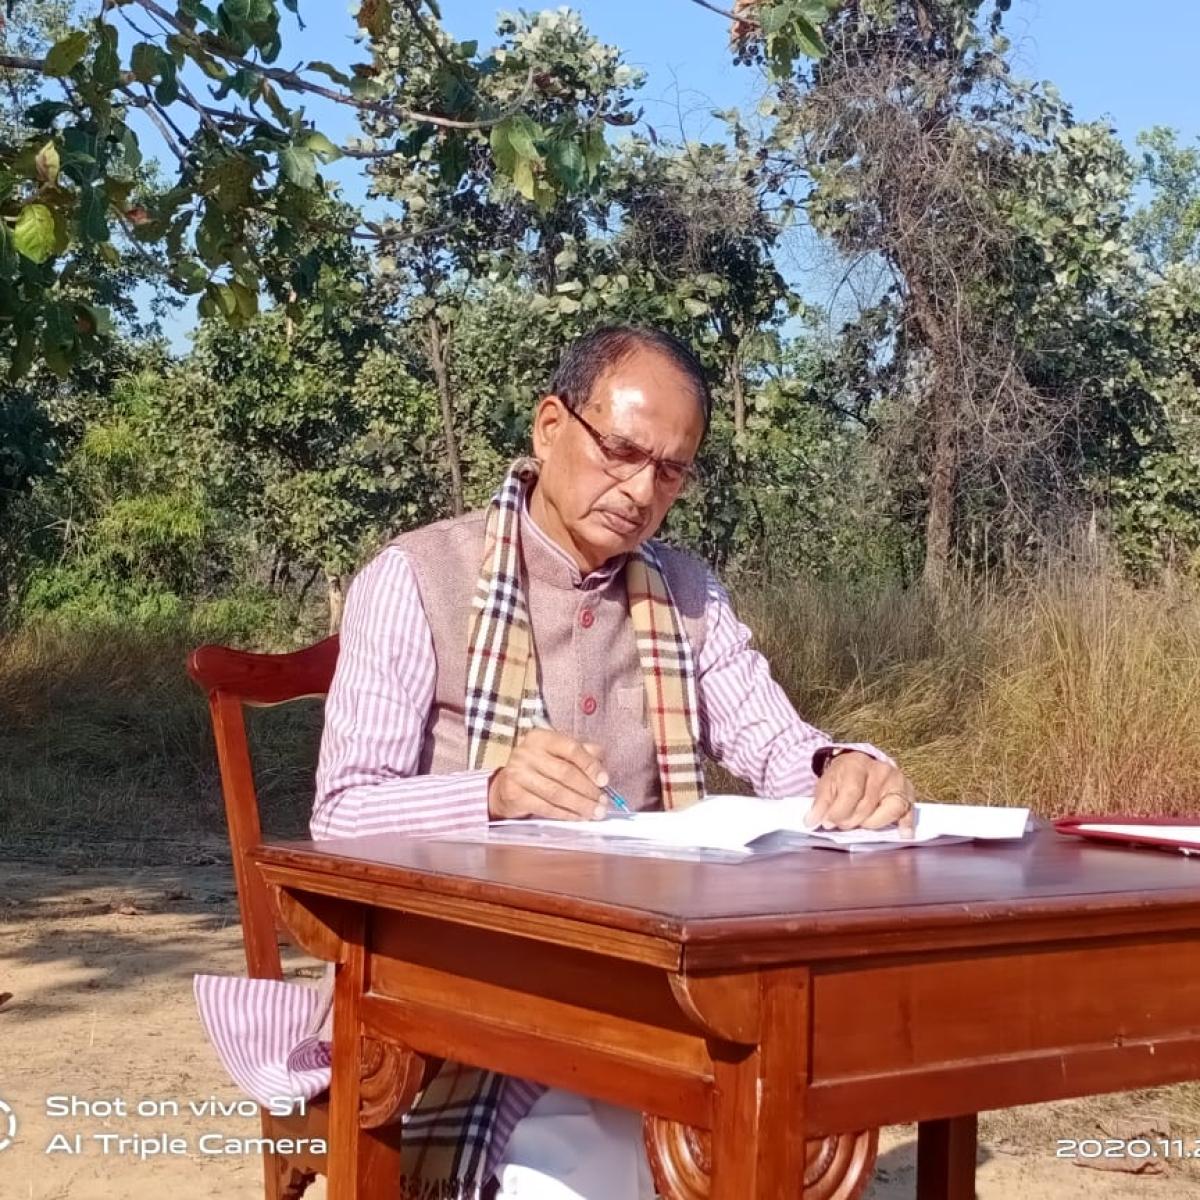 Madhya Pradesh: CM Shivraj Singh Chouhan prepares for work schedule in Bandhavgarh